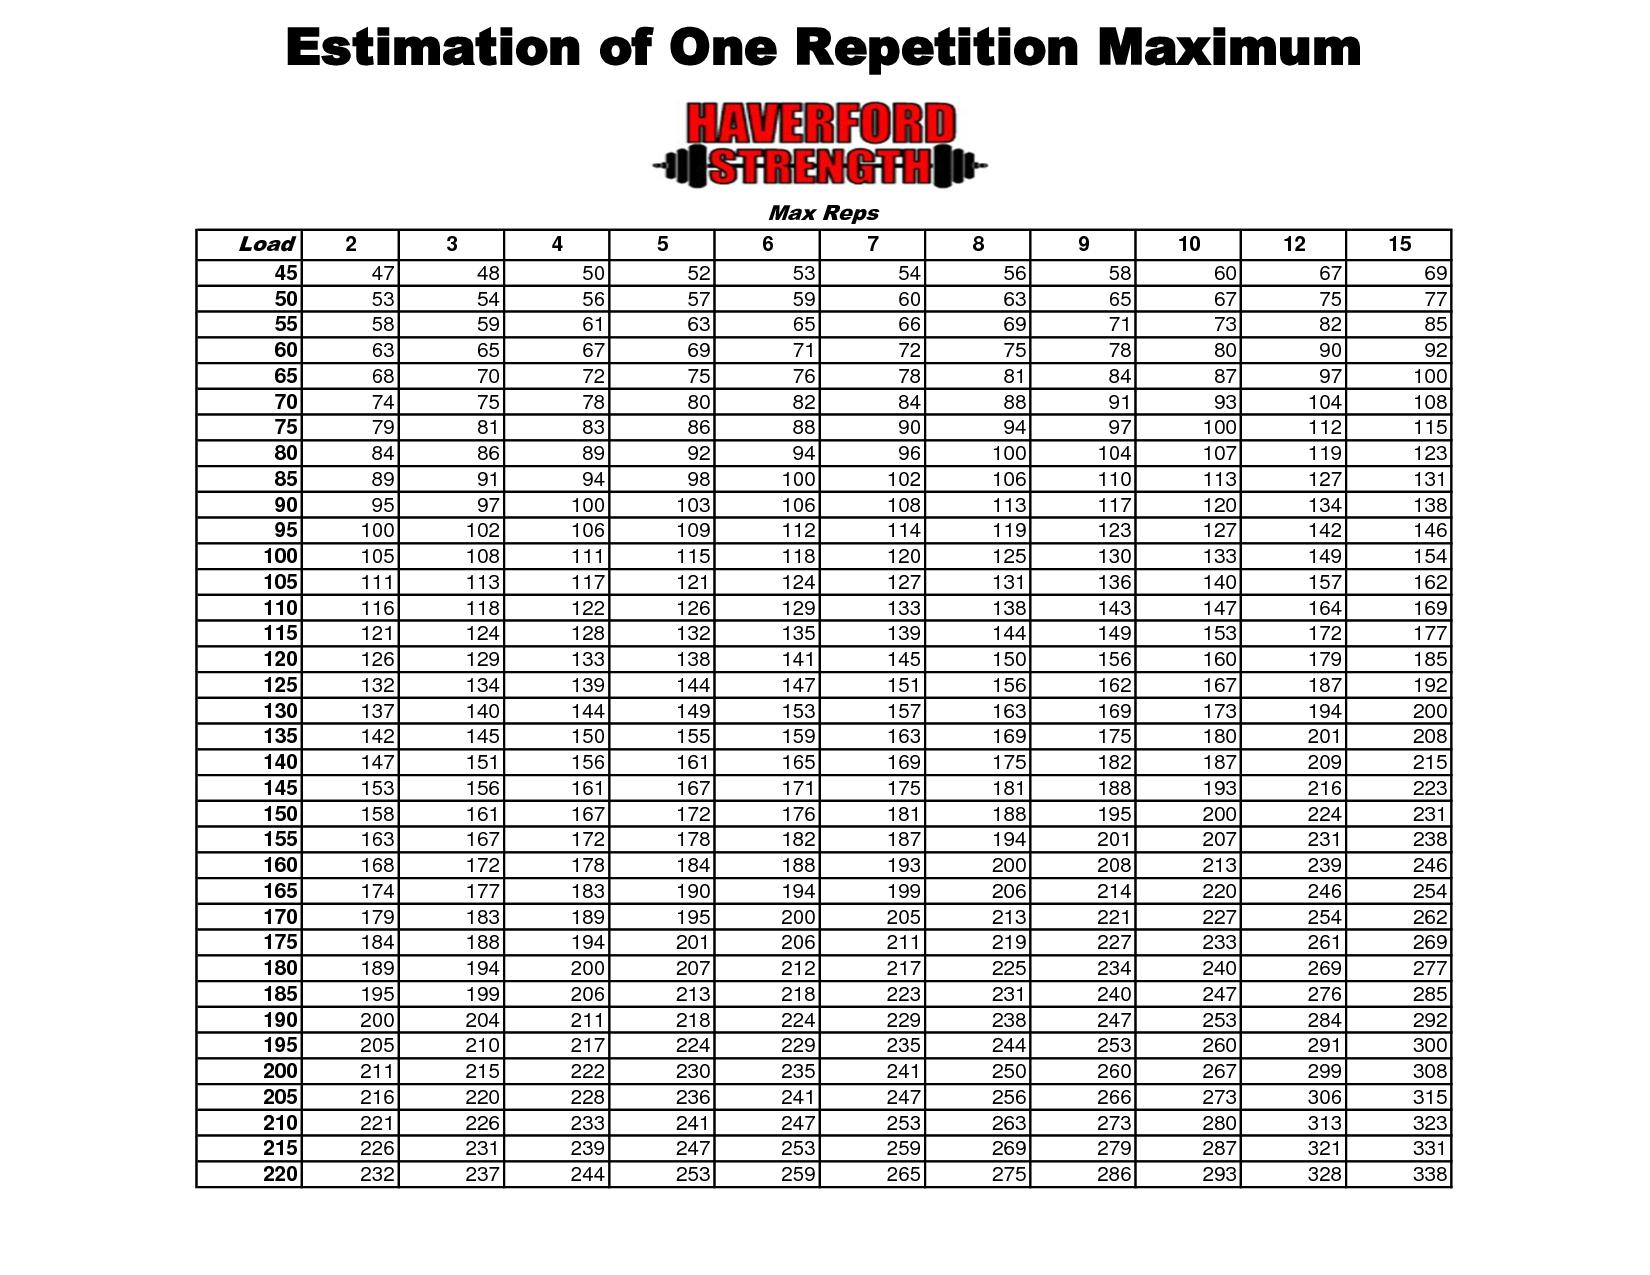 Max Lifting Weight Rep Chart